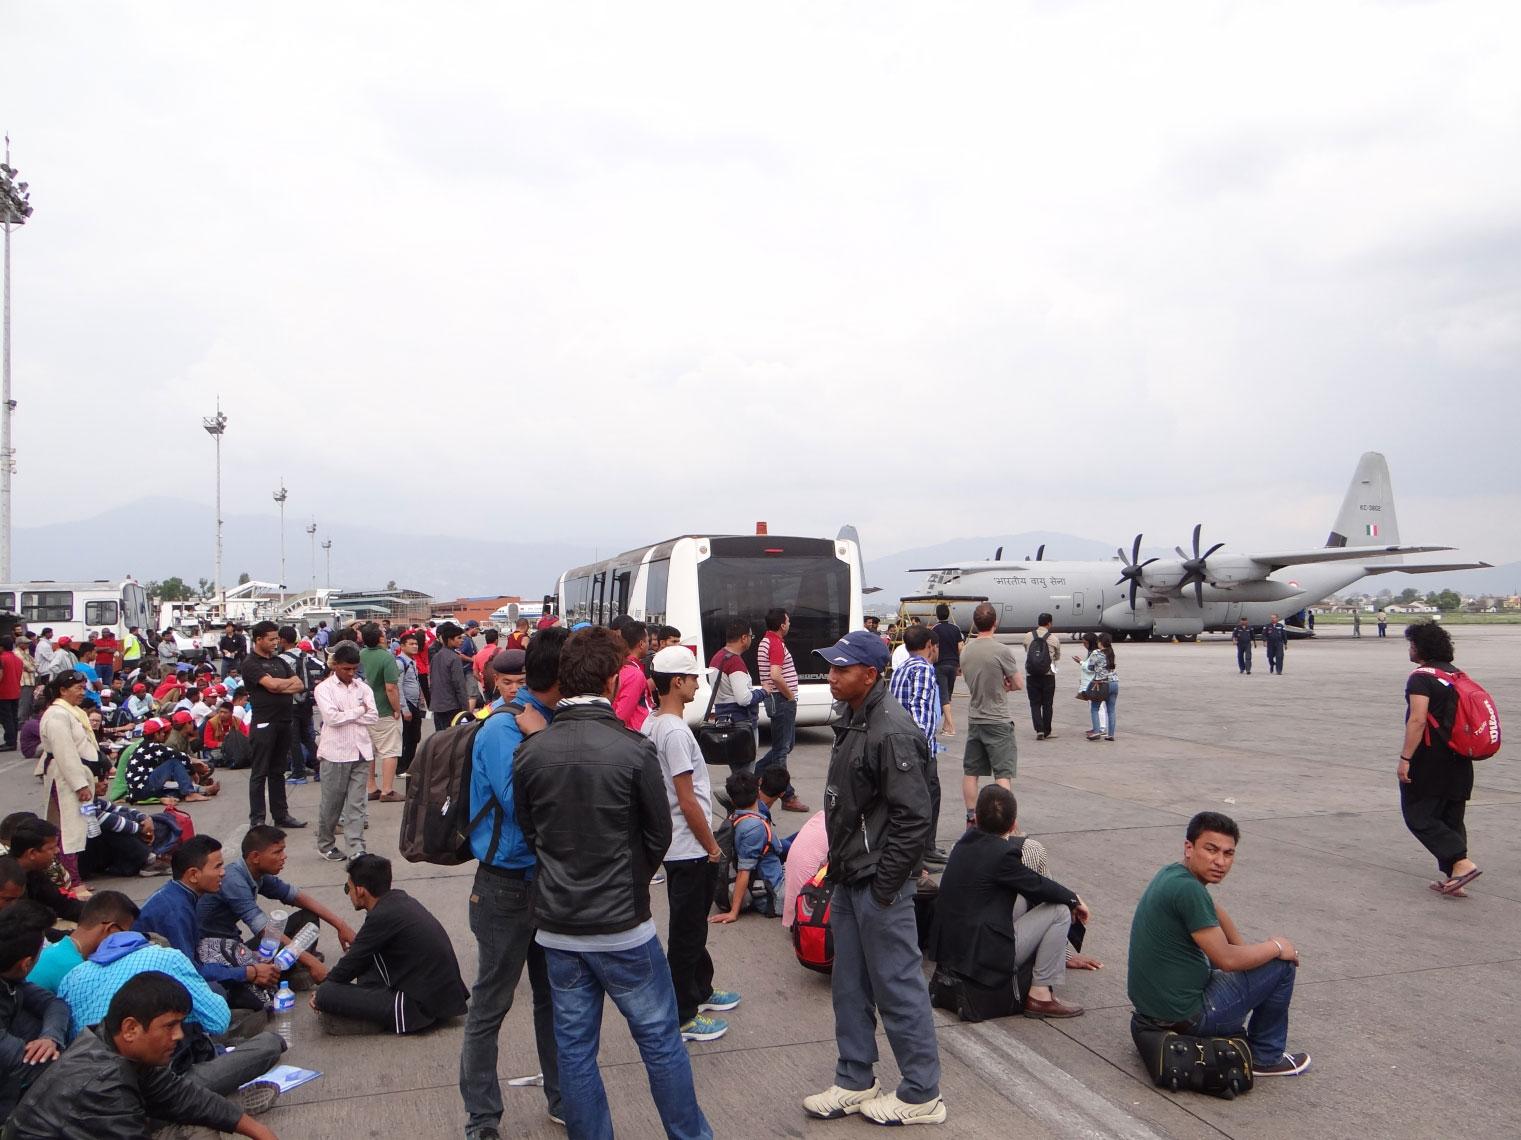 Kanchenjunga trek earthquake